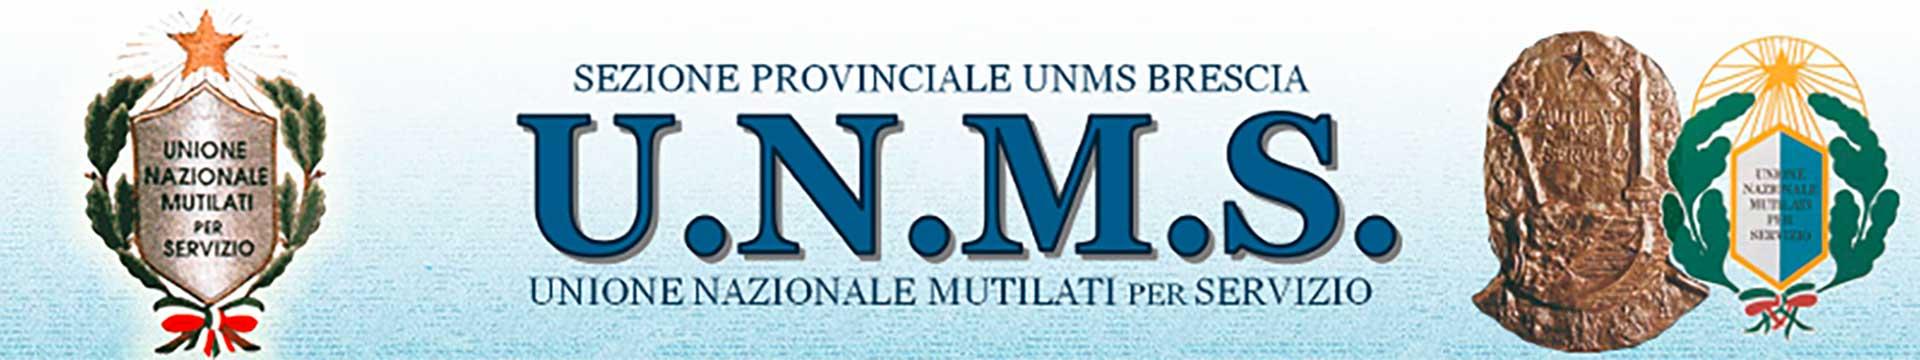 U.N.M.S. Brescia – Unione Nazionale Mutilati per Servizio – sezione di Brescia